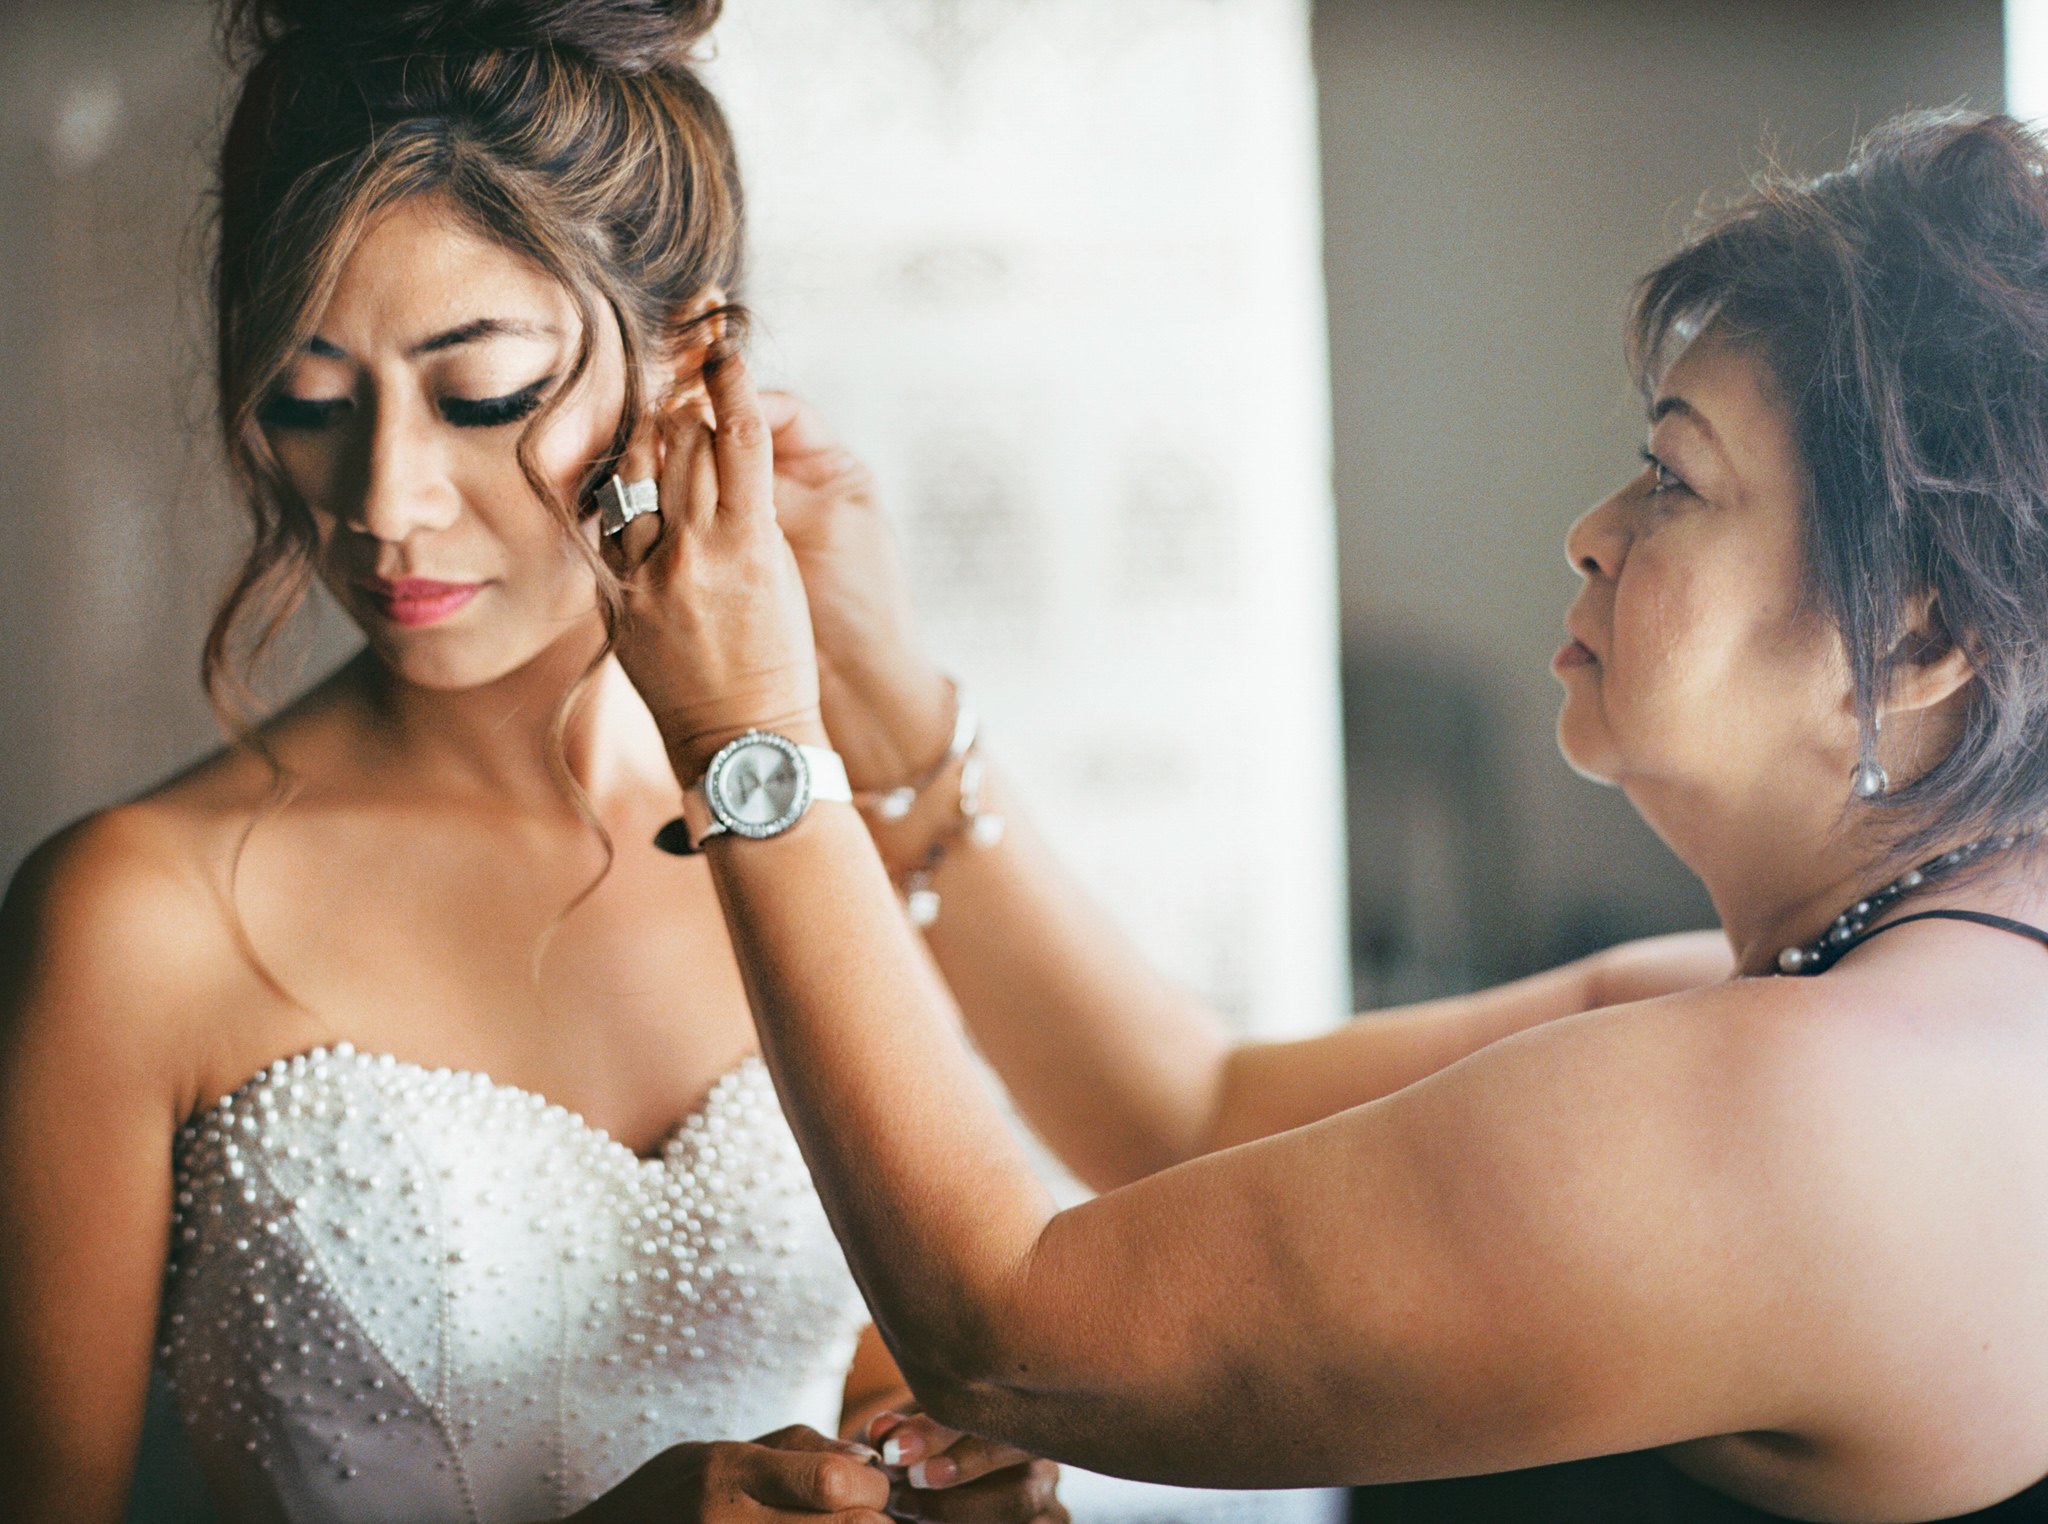 013OutliveCreative_Travel_Photographer_Videographer_Lewis&Clark_Oregon_Elegant_BlackTie_Destination_Wedding.jpg